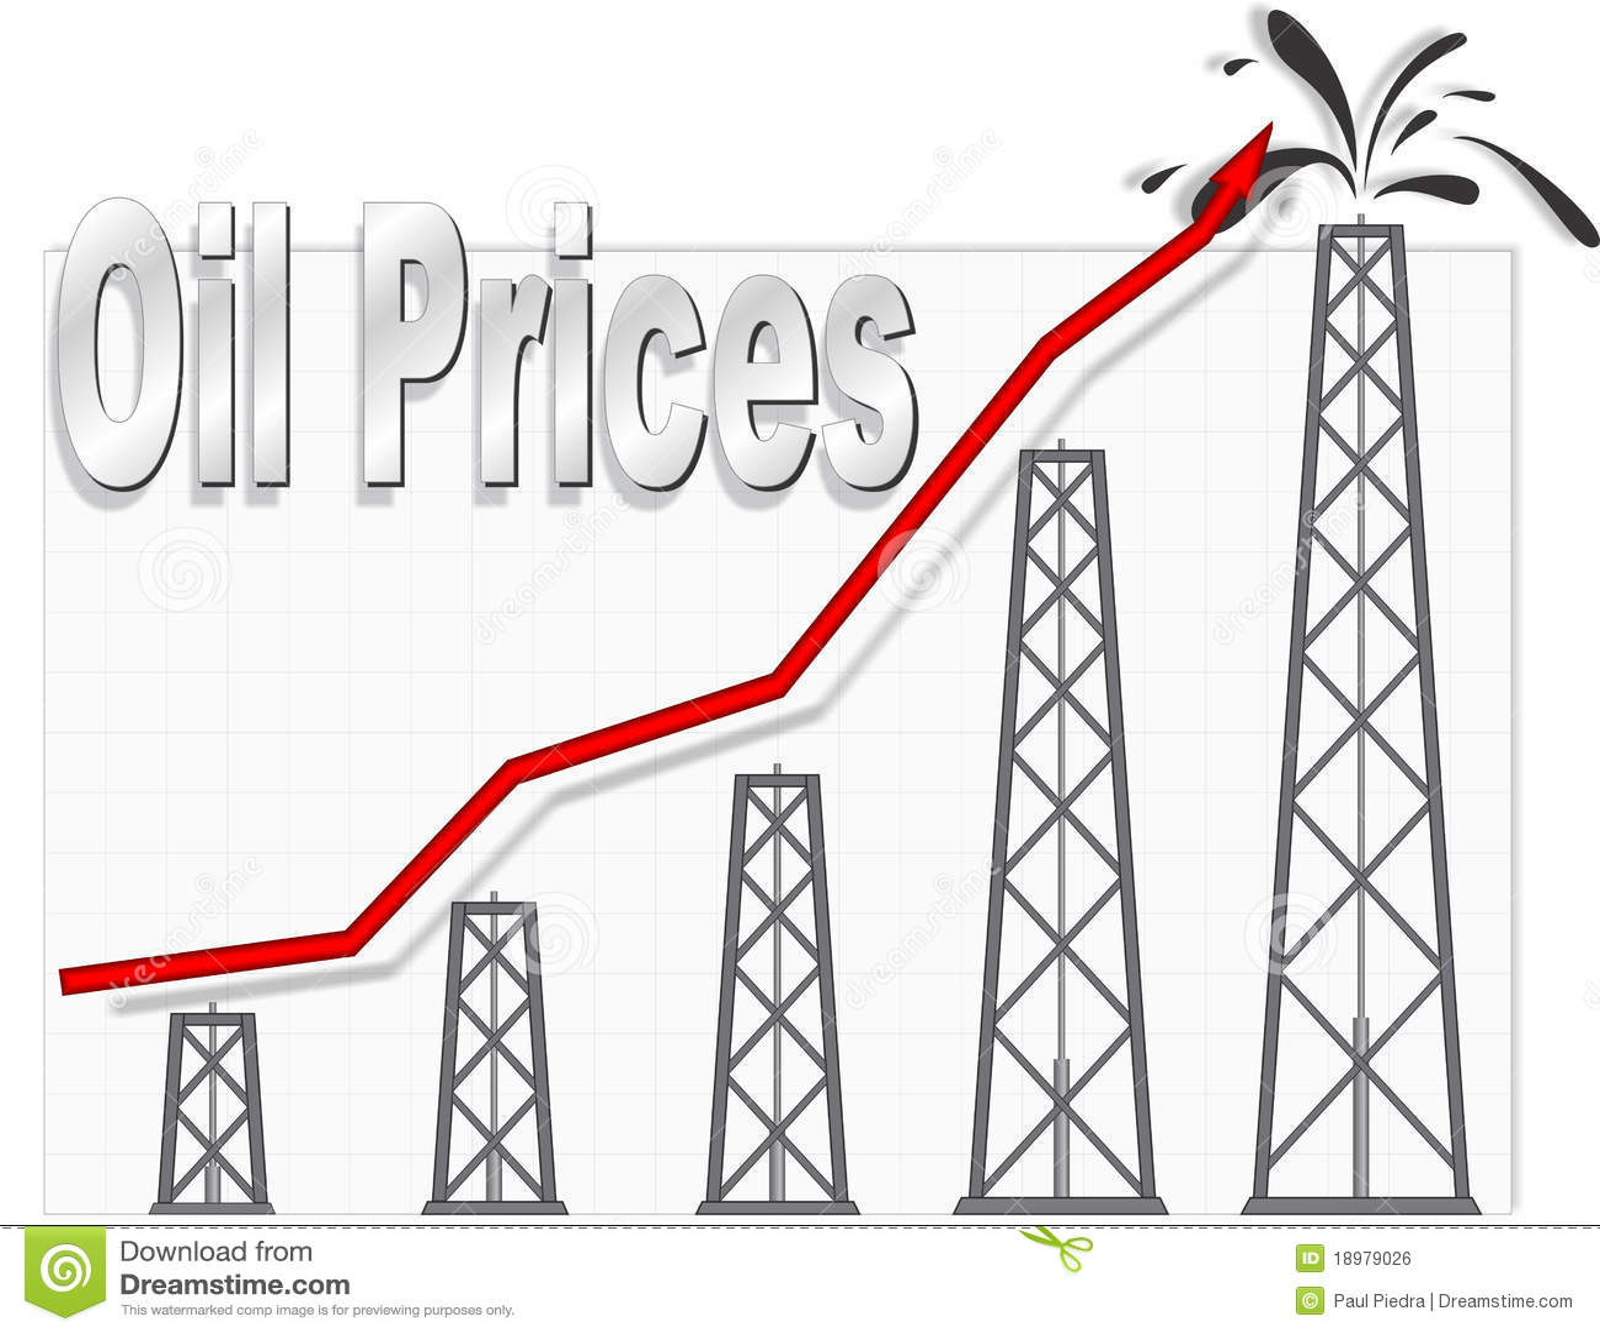 Oil Price Chart stock vector. Illustration of money, well